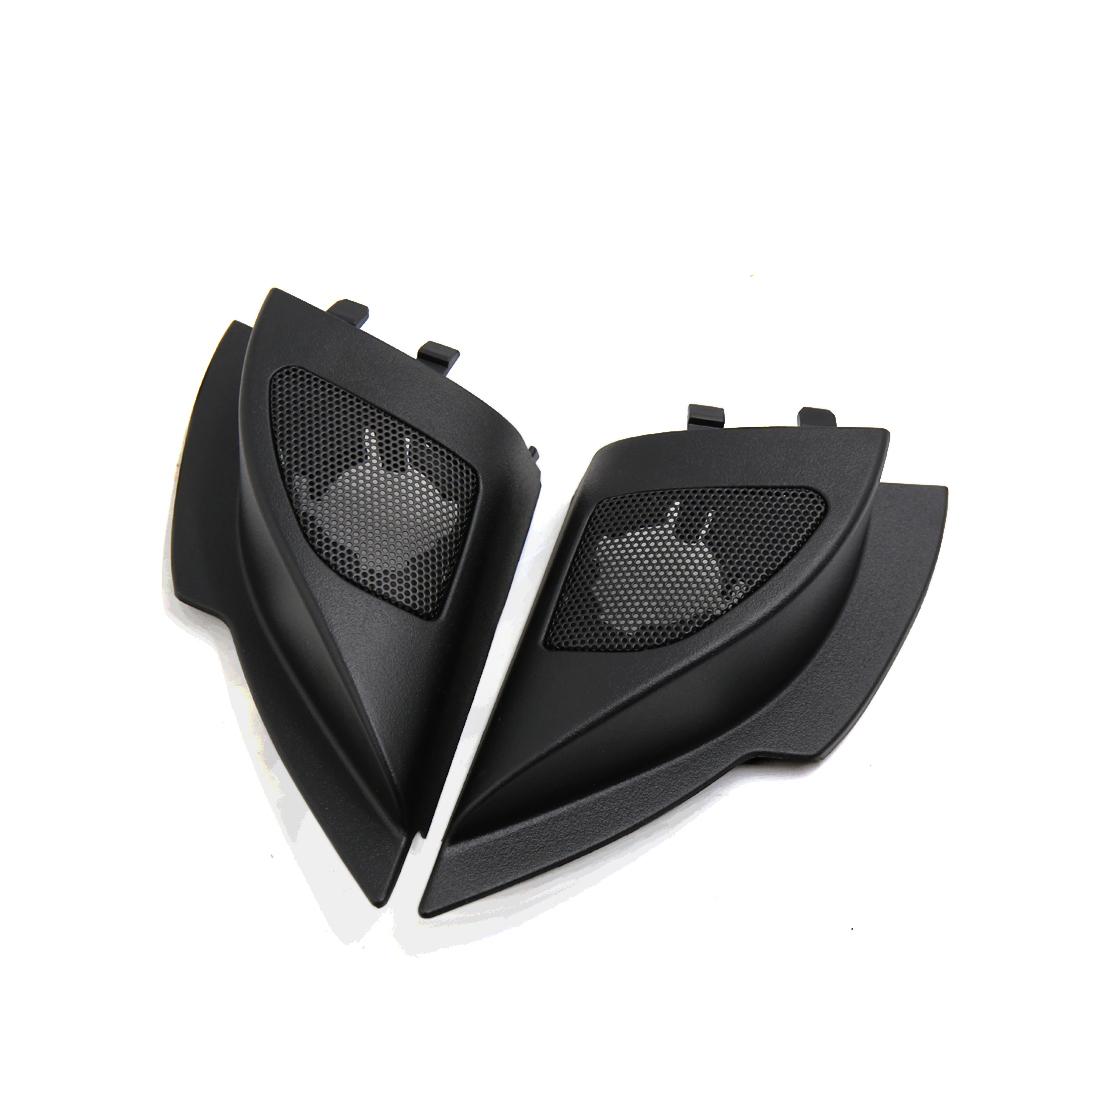 2 Pcs Mesh Black Car Tweeter Trumpet Dustproof Cover for 2011 Mitsubishi Lancer